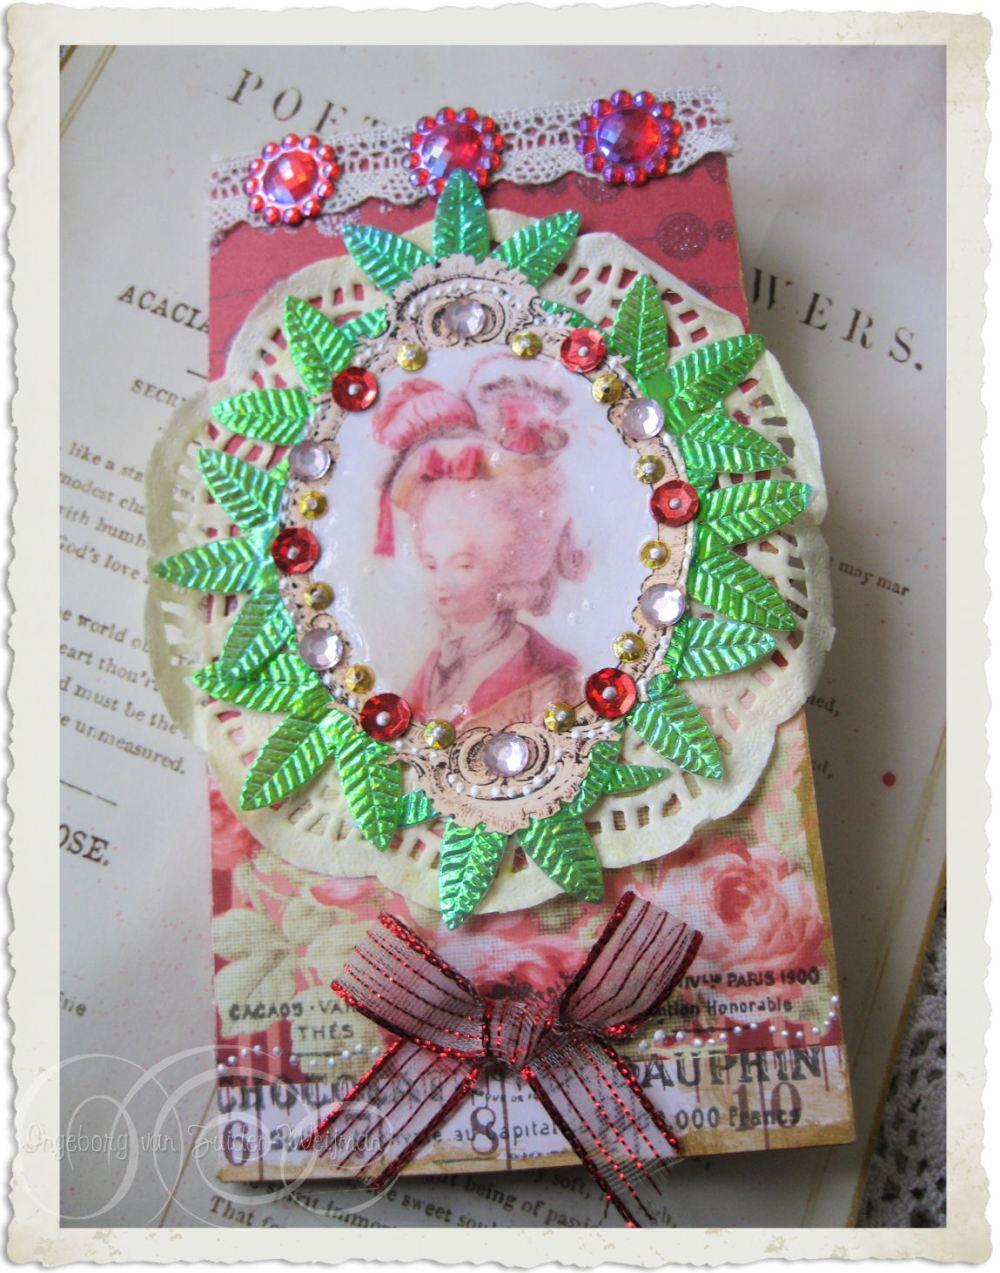 Marie's Christmas tea invitation by Ingeborg van Zuiden